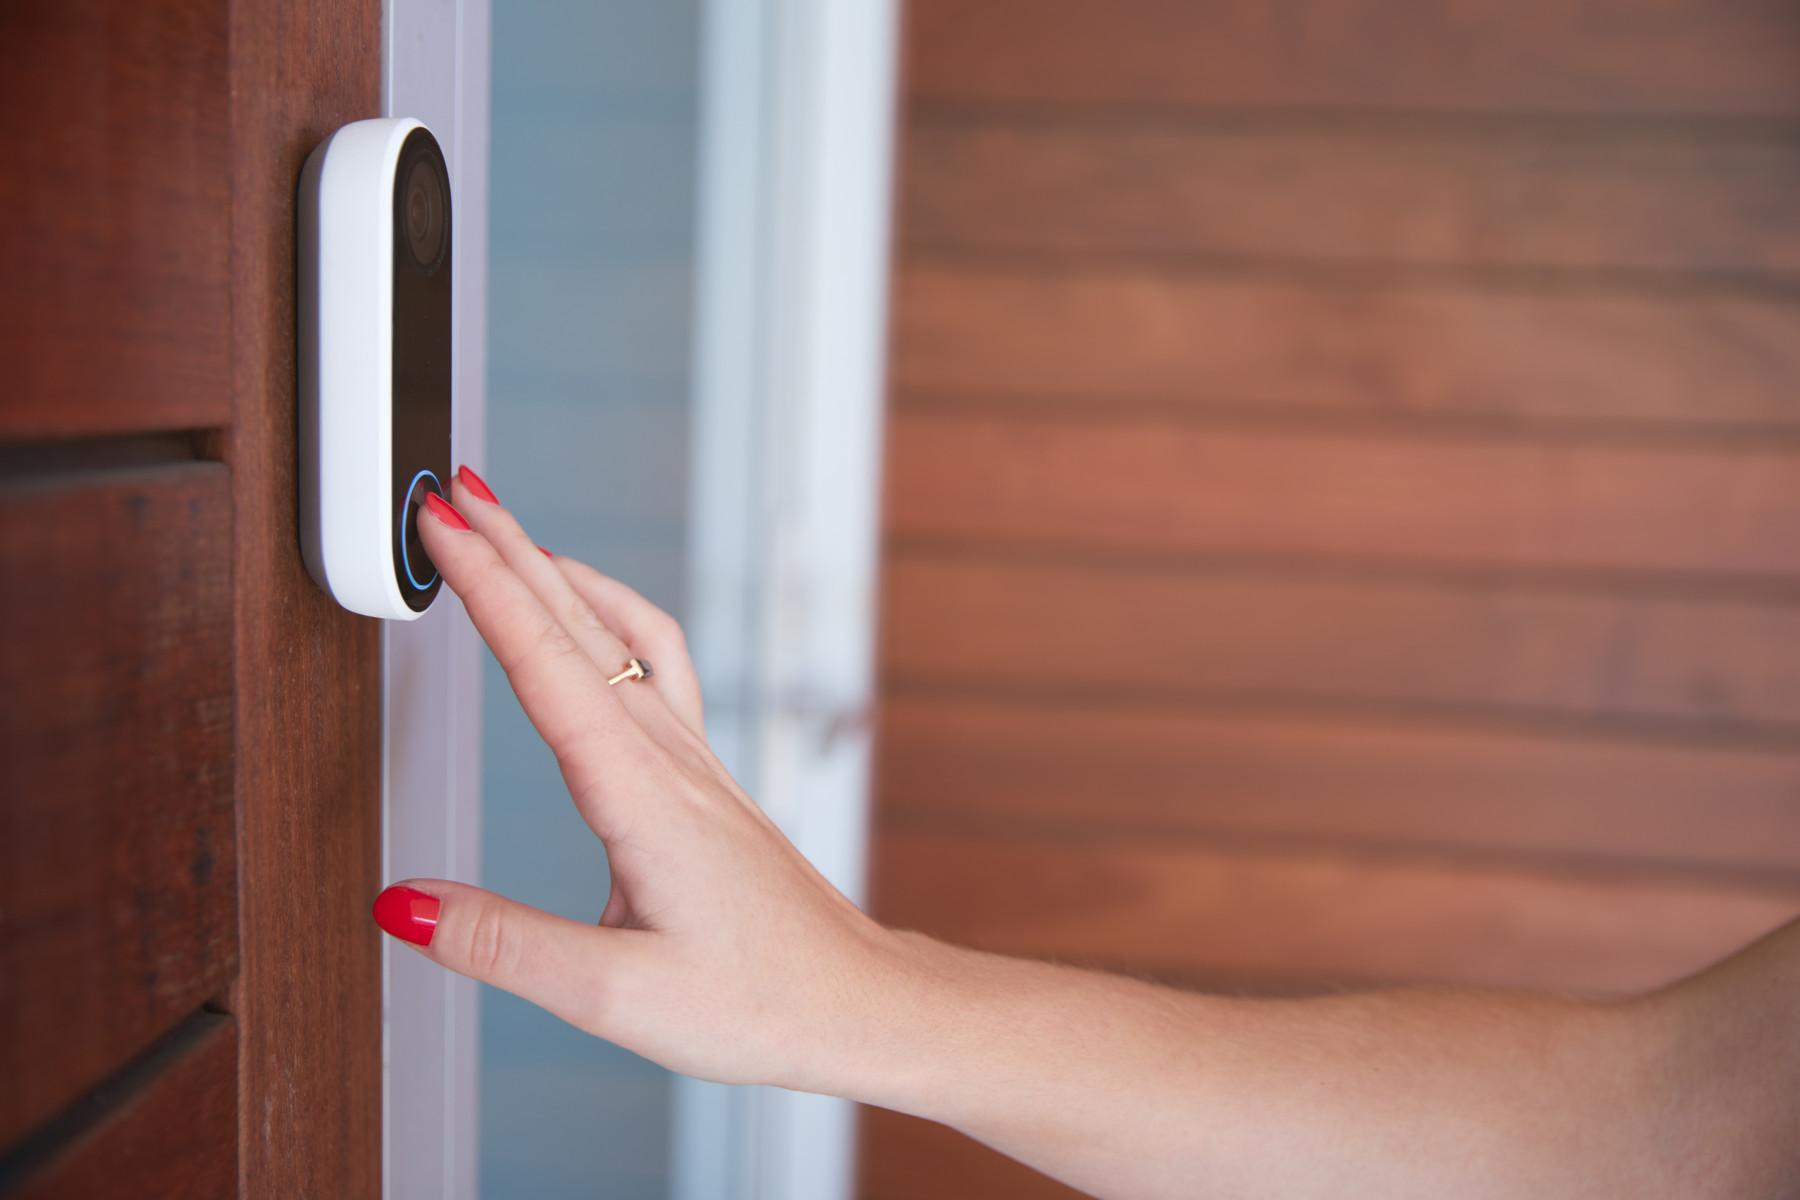 doorbell troubleshooting - Tim Kyle